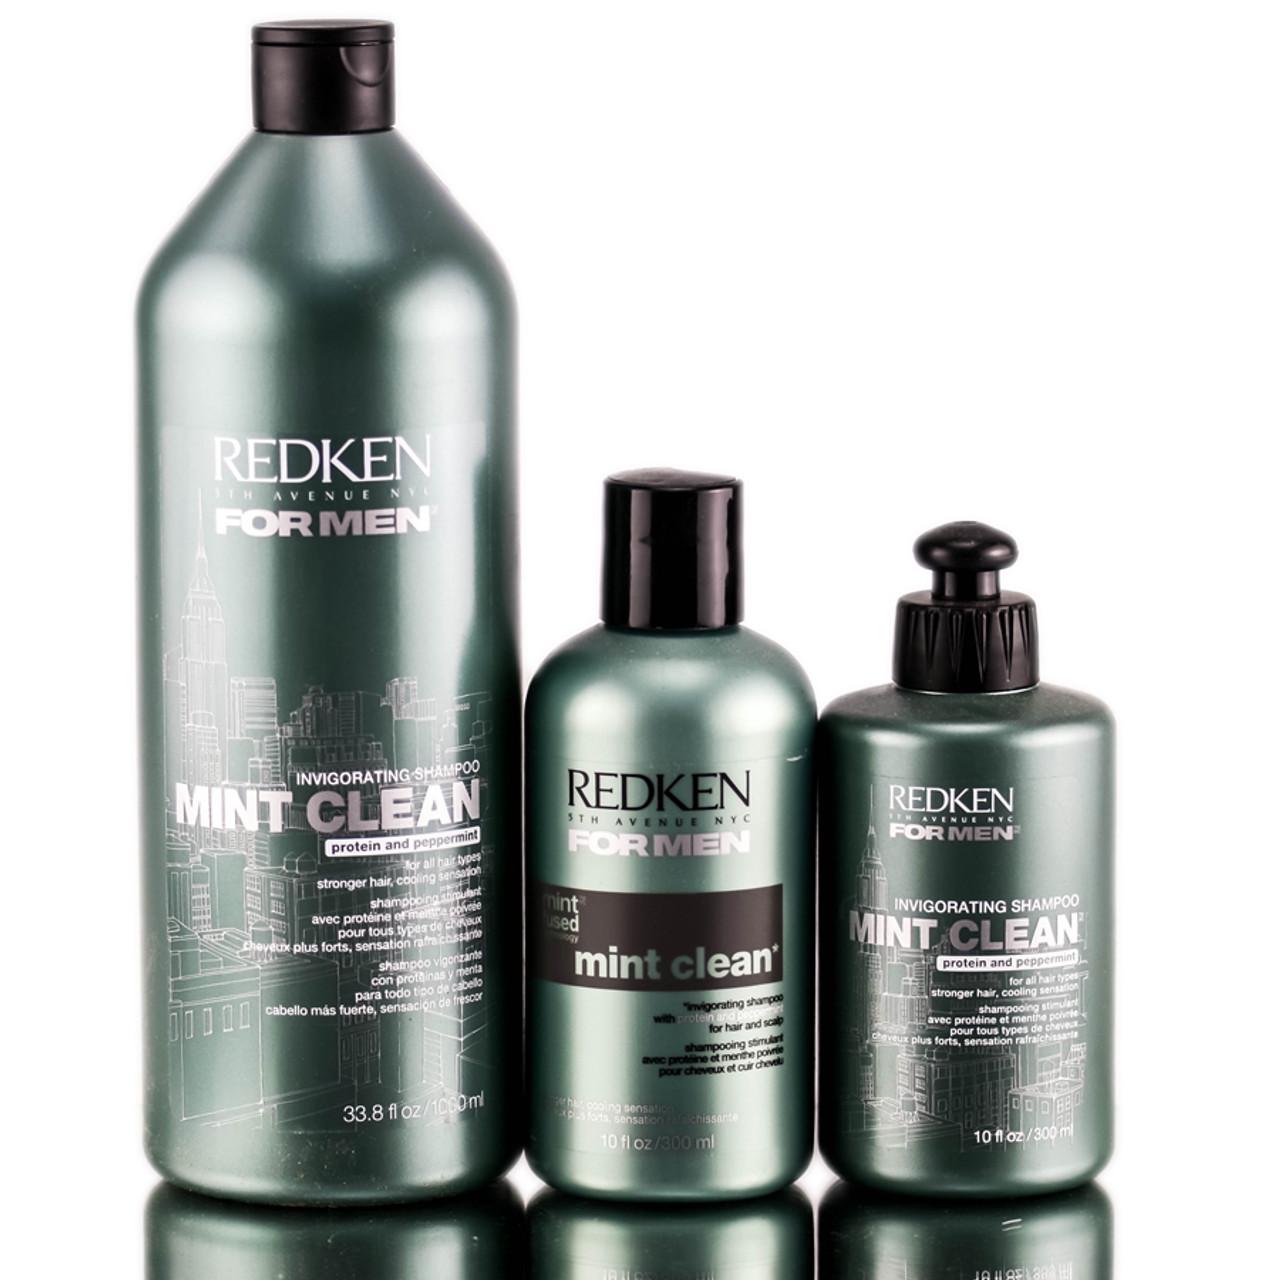 Redken For Men Mint Clean Invigorating Shampoo Sleekshop Com Formerly Sleekhair